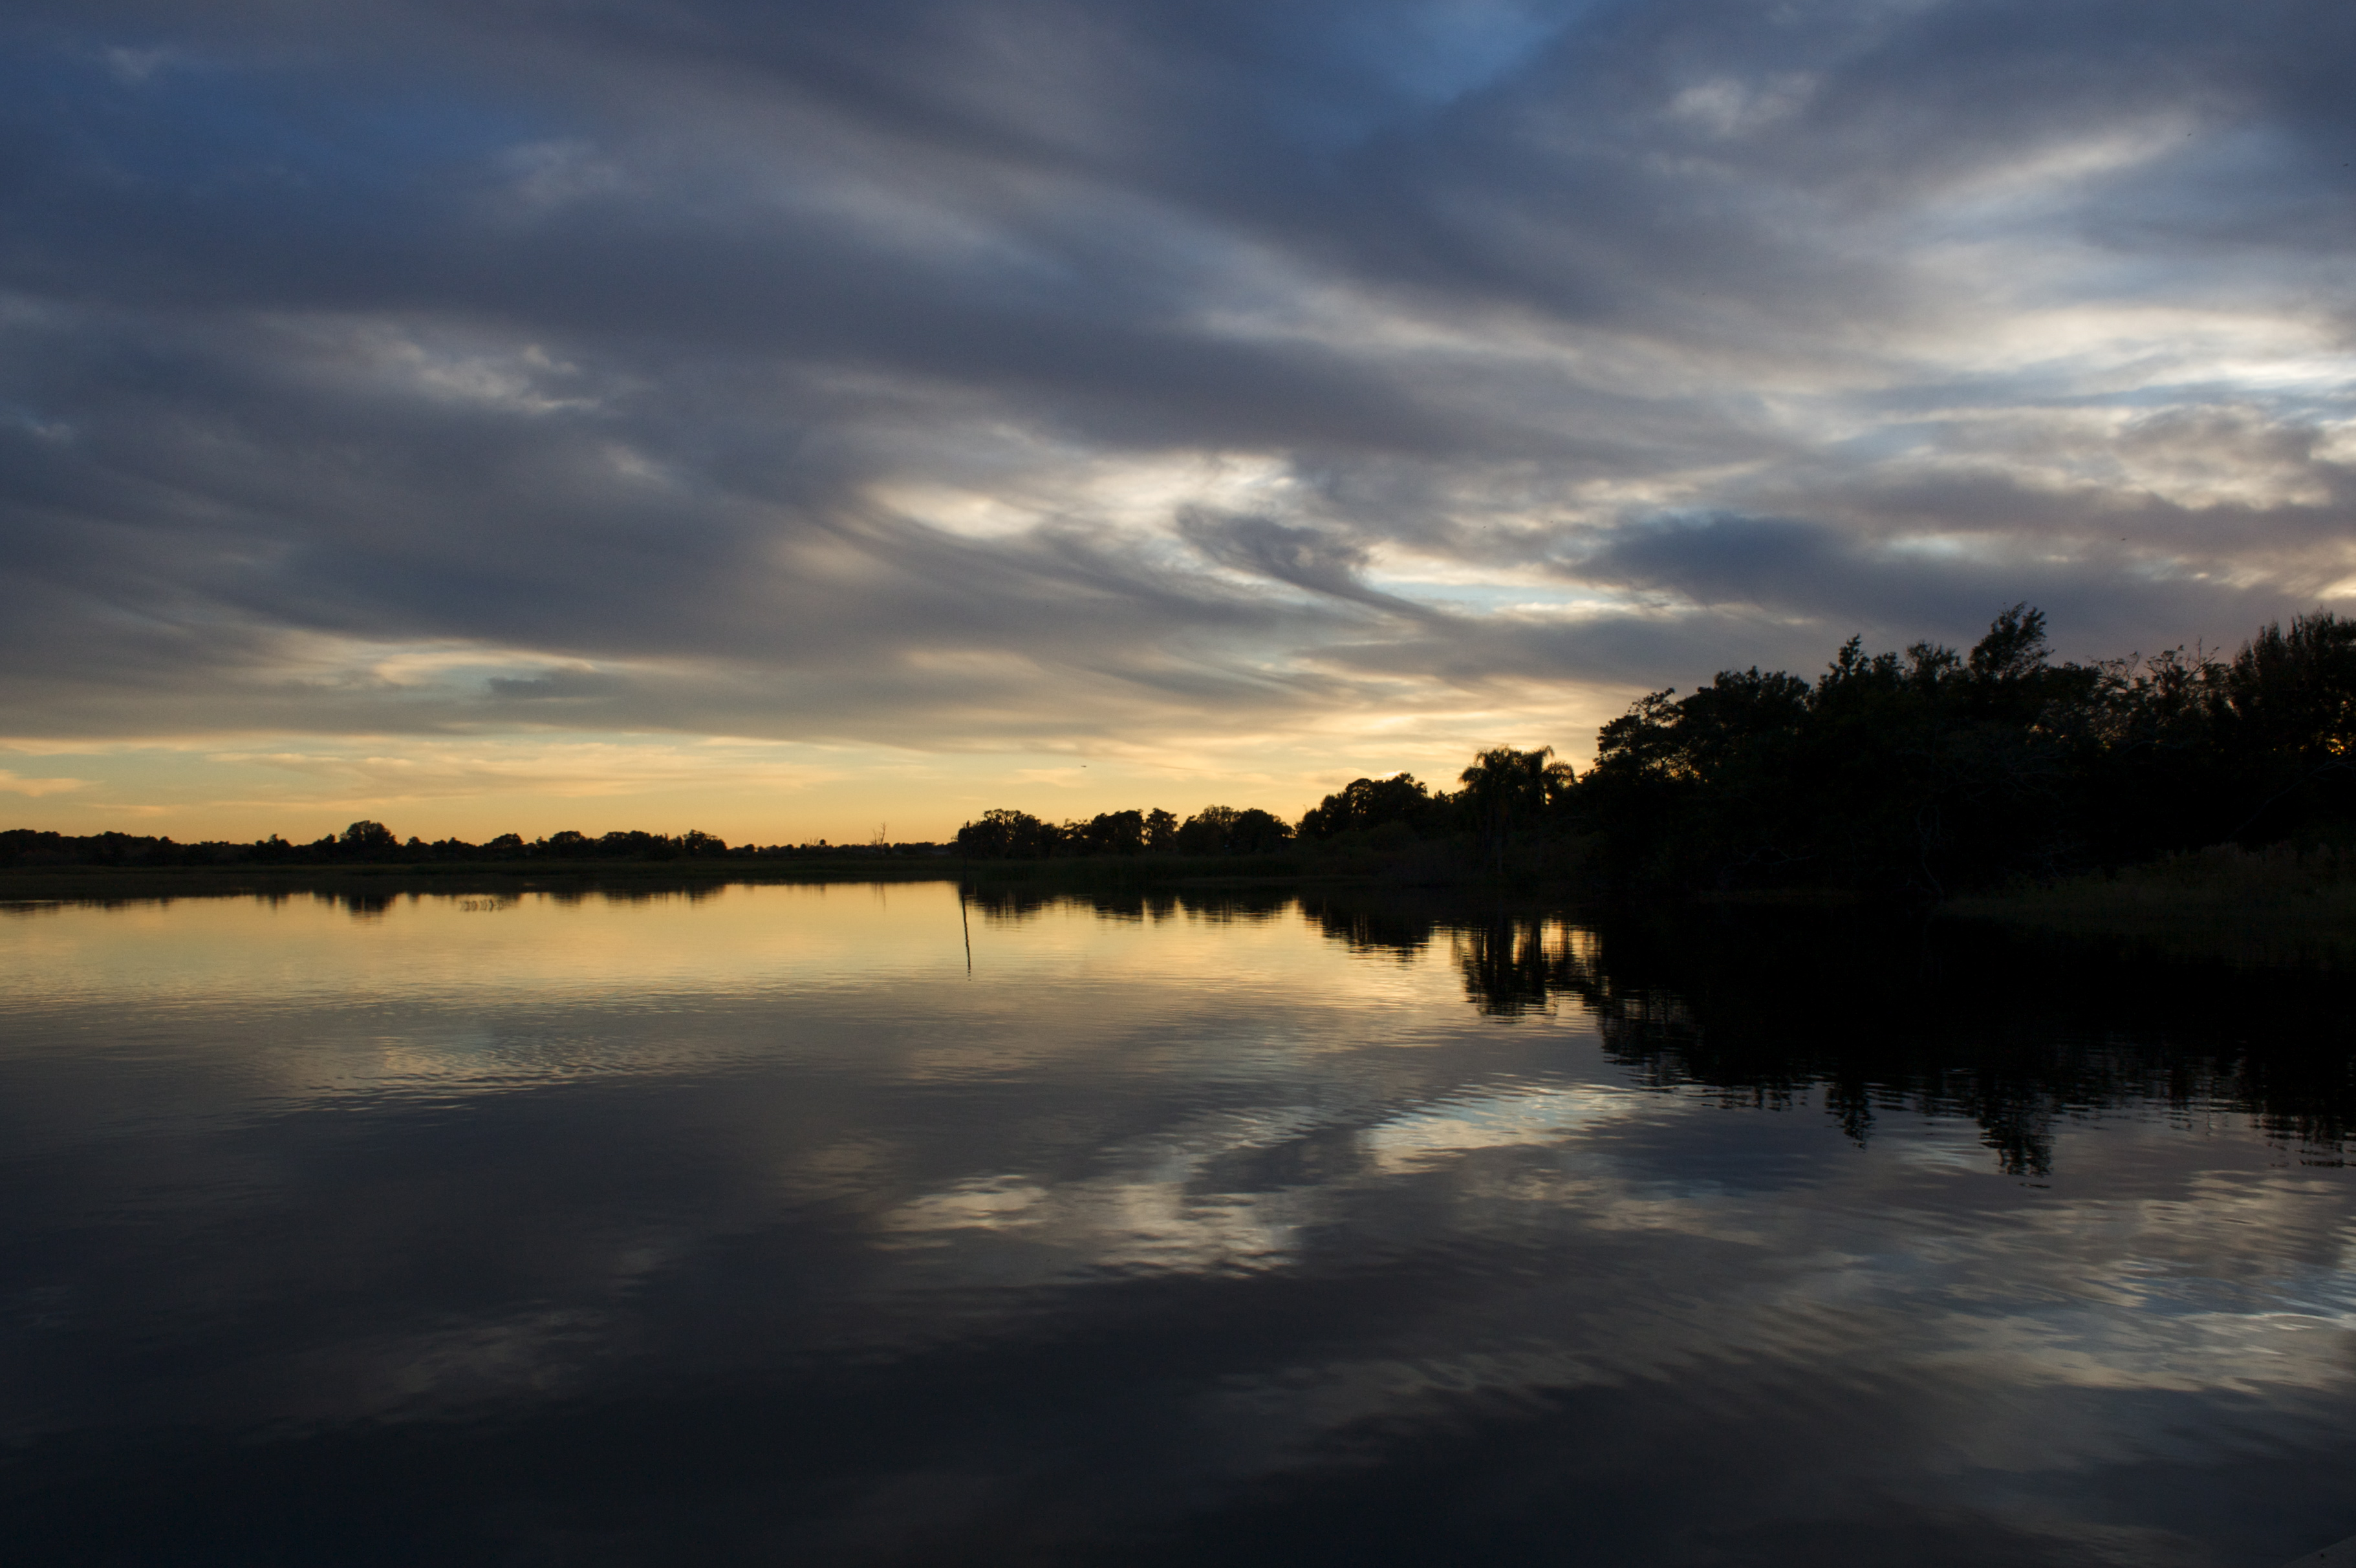 Lake Tohopekaliga, Kissimmee FL (November 2008) [OC][3643x2425]